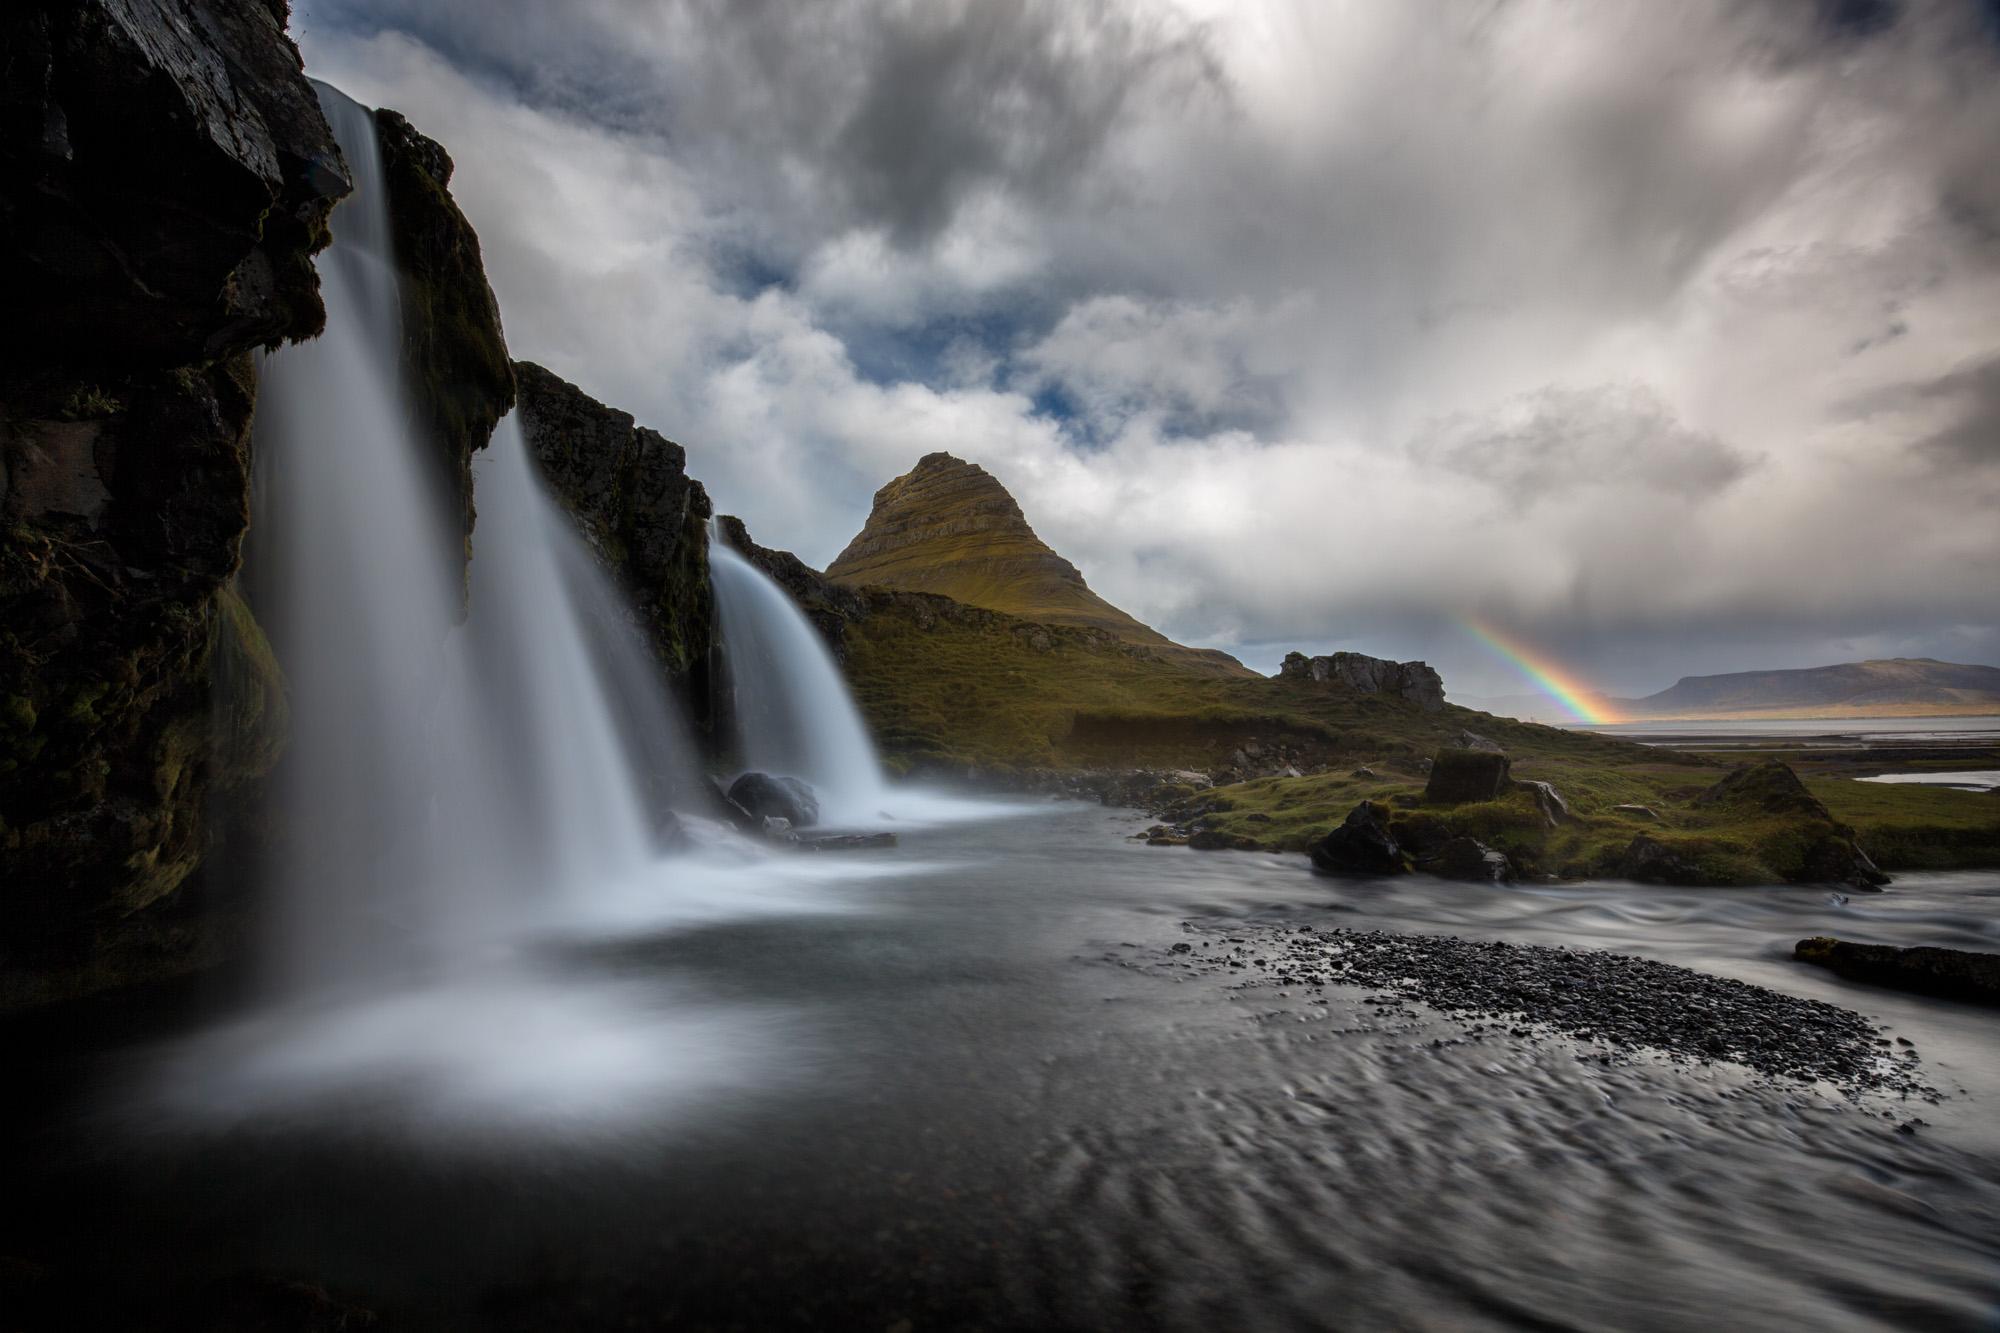 antonyz long exposure landscape photograph of rkirkjuellfoss waterfall in iceland